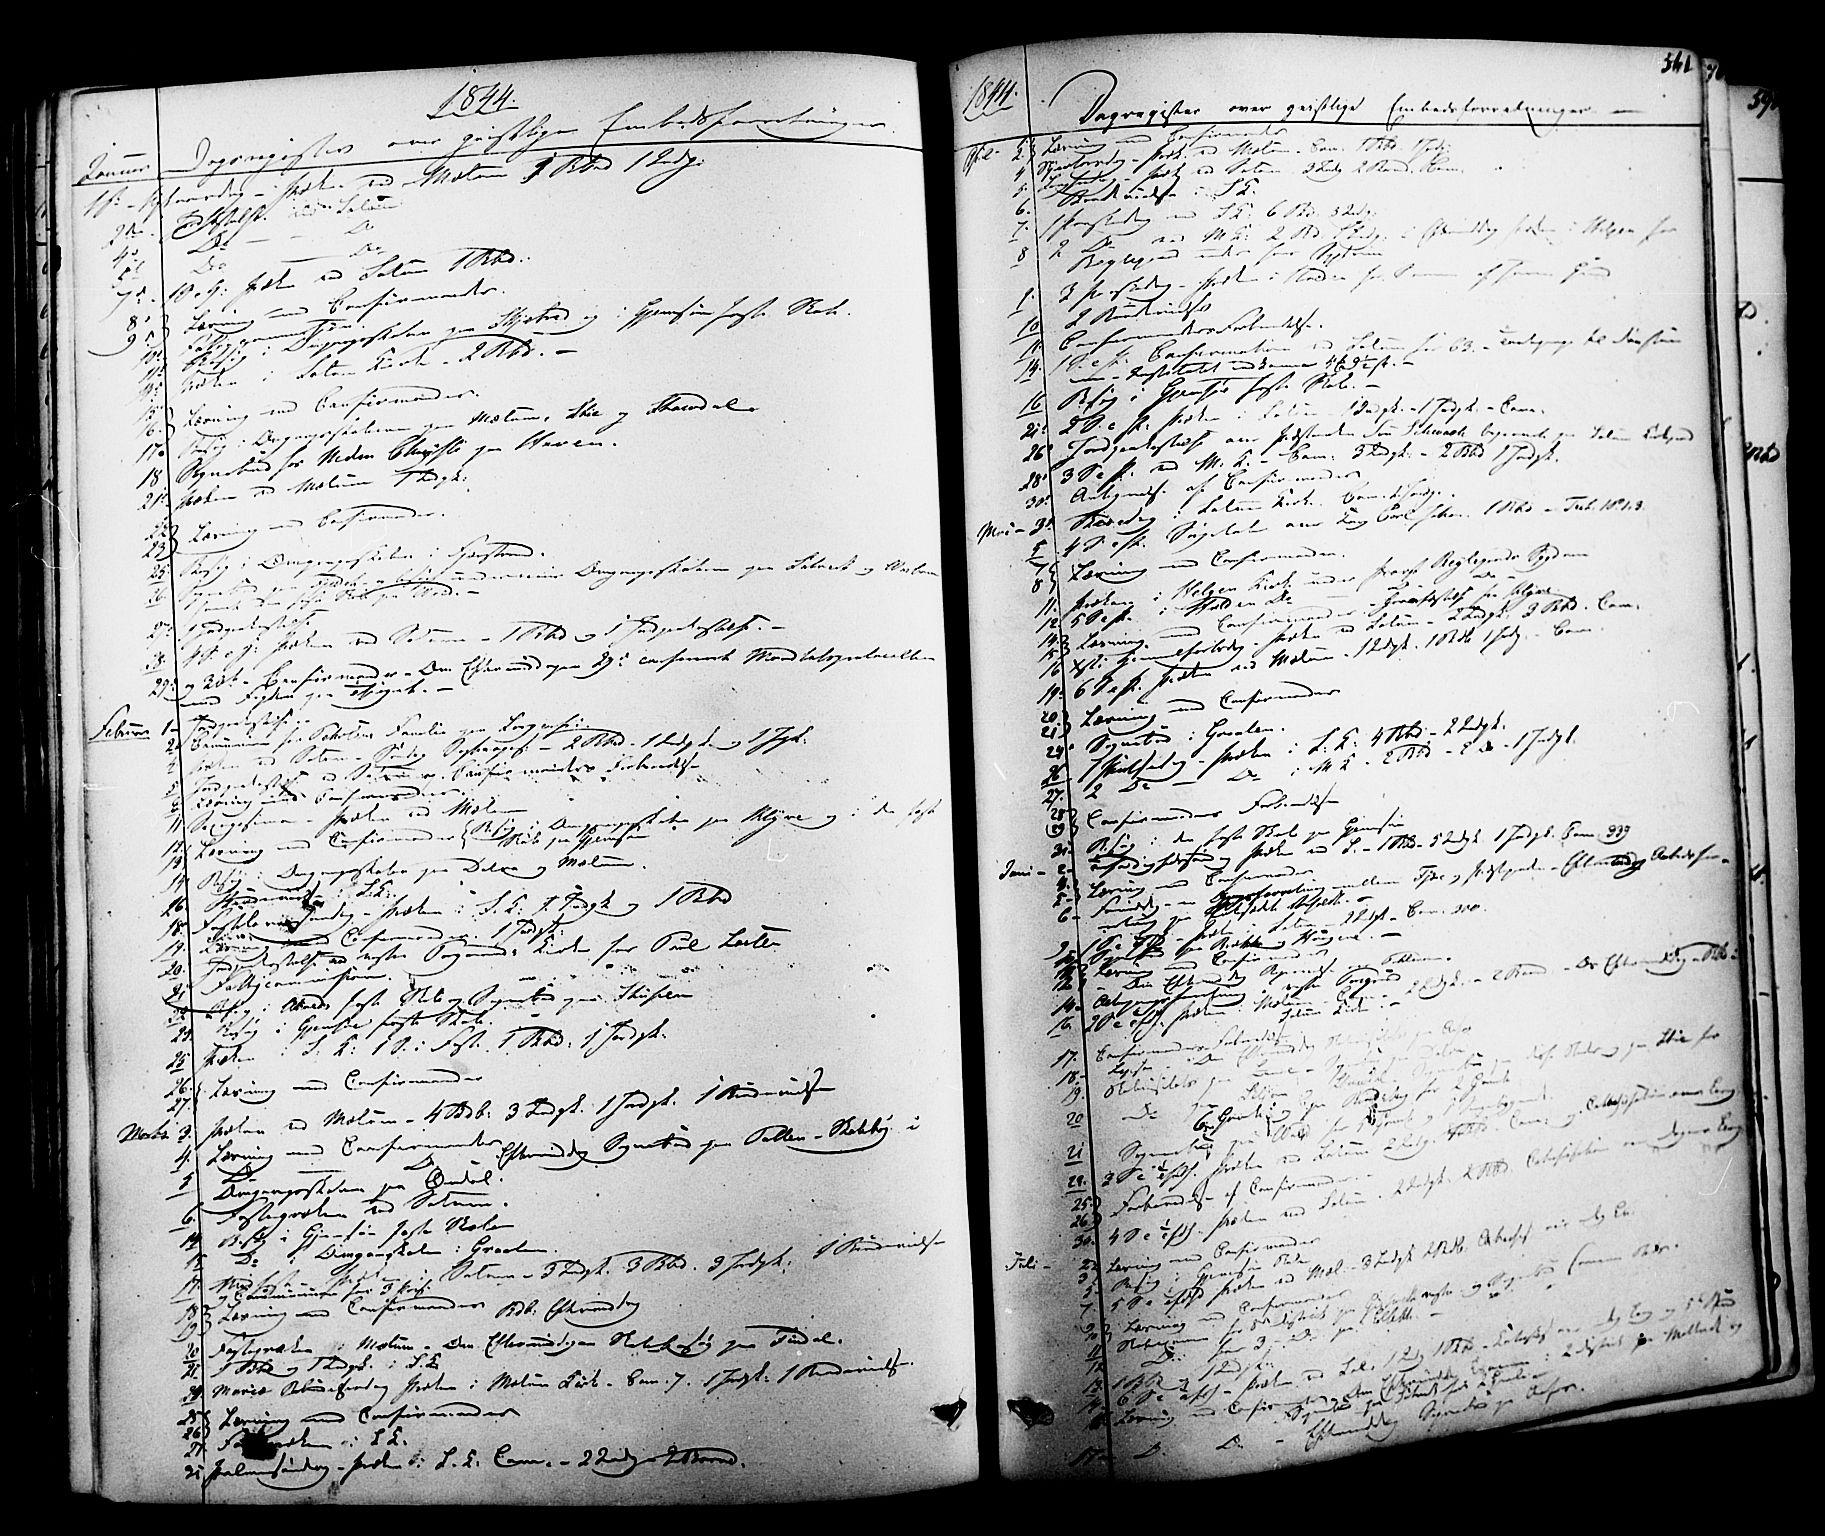 SAKO, Solum kirkebøker, F/Fa/L0006: Ministerialbok nr. I 6, 1844-1855, s. 561